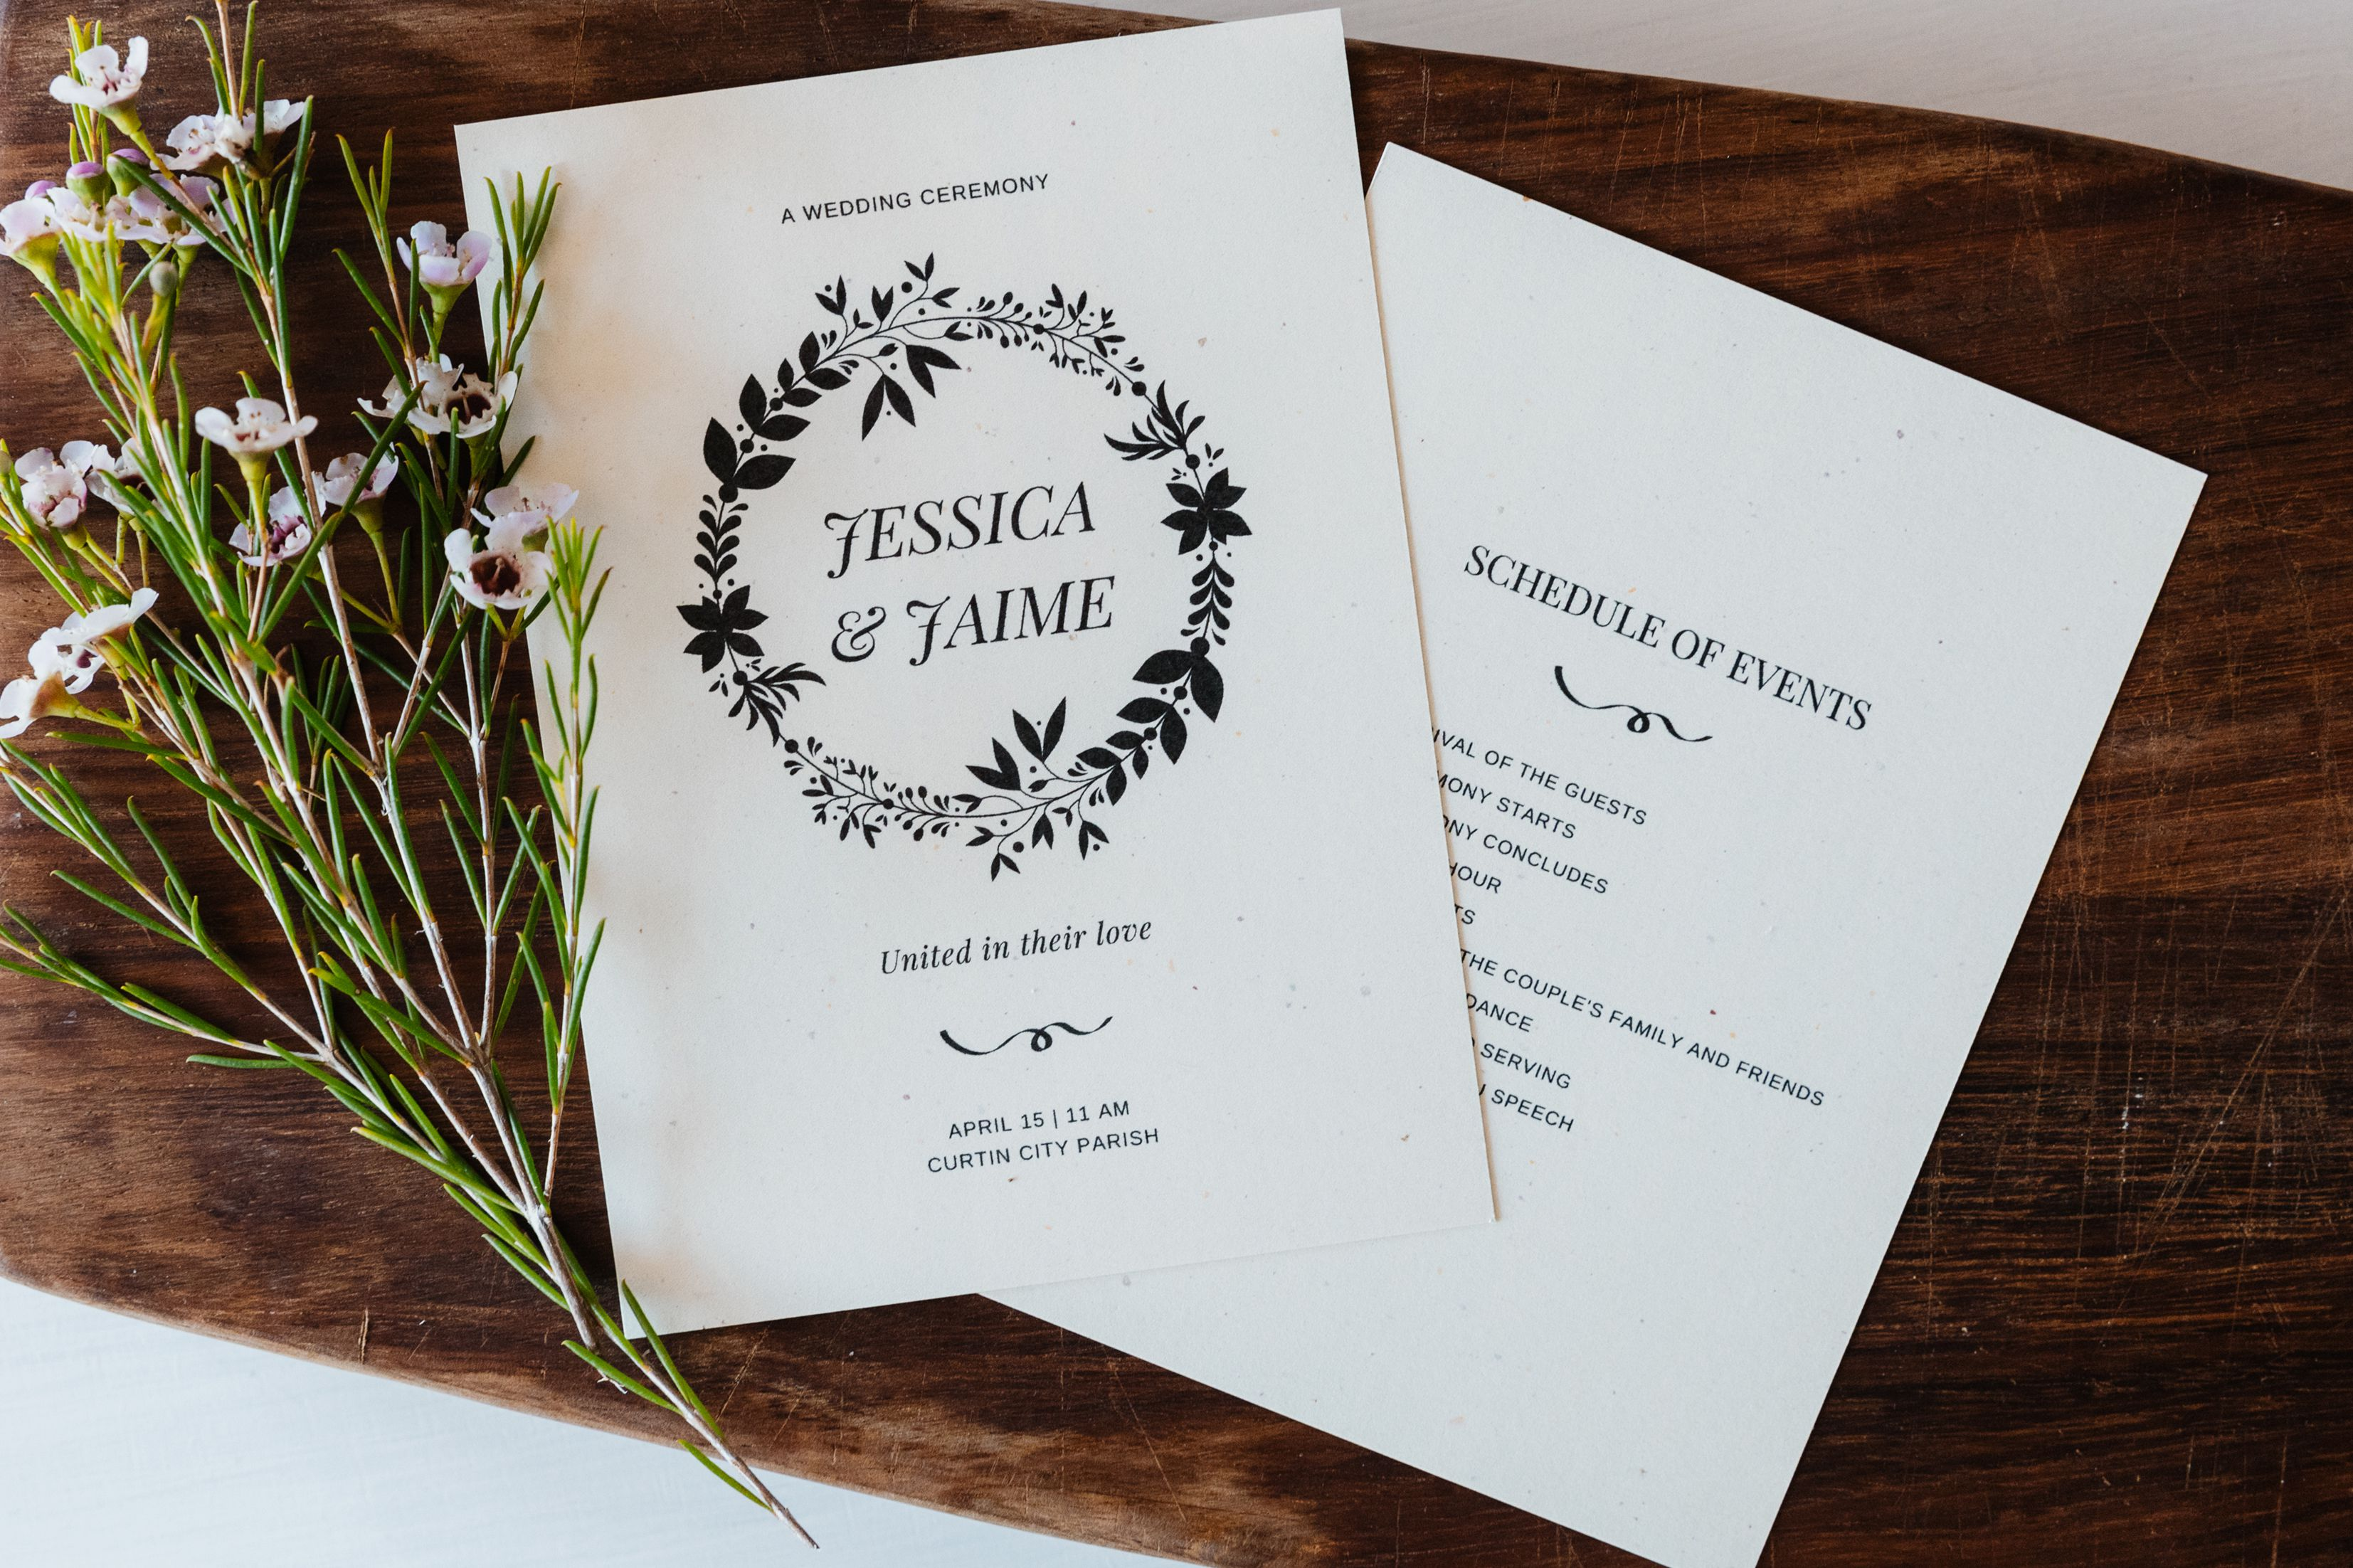 Free Wedding Program Templates You Can Customize